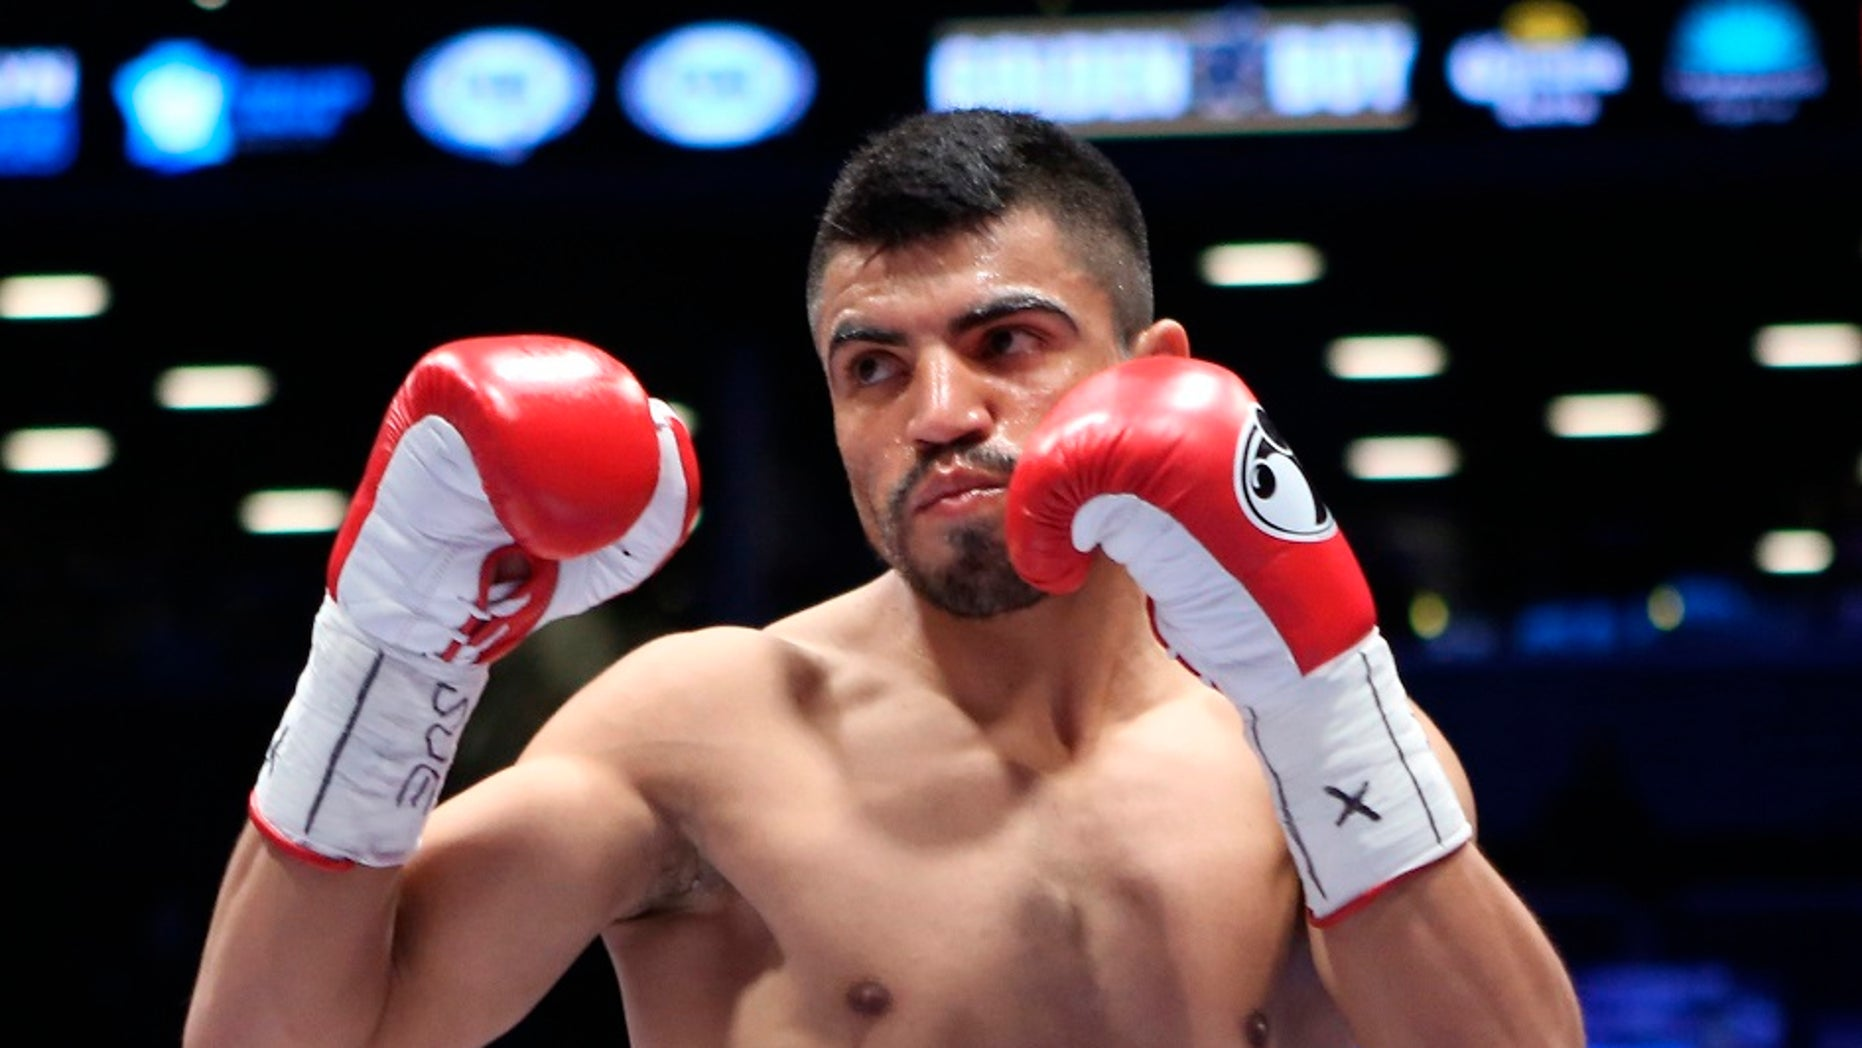 Victor Ortiz fight canceled following sexual assault arrest